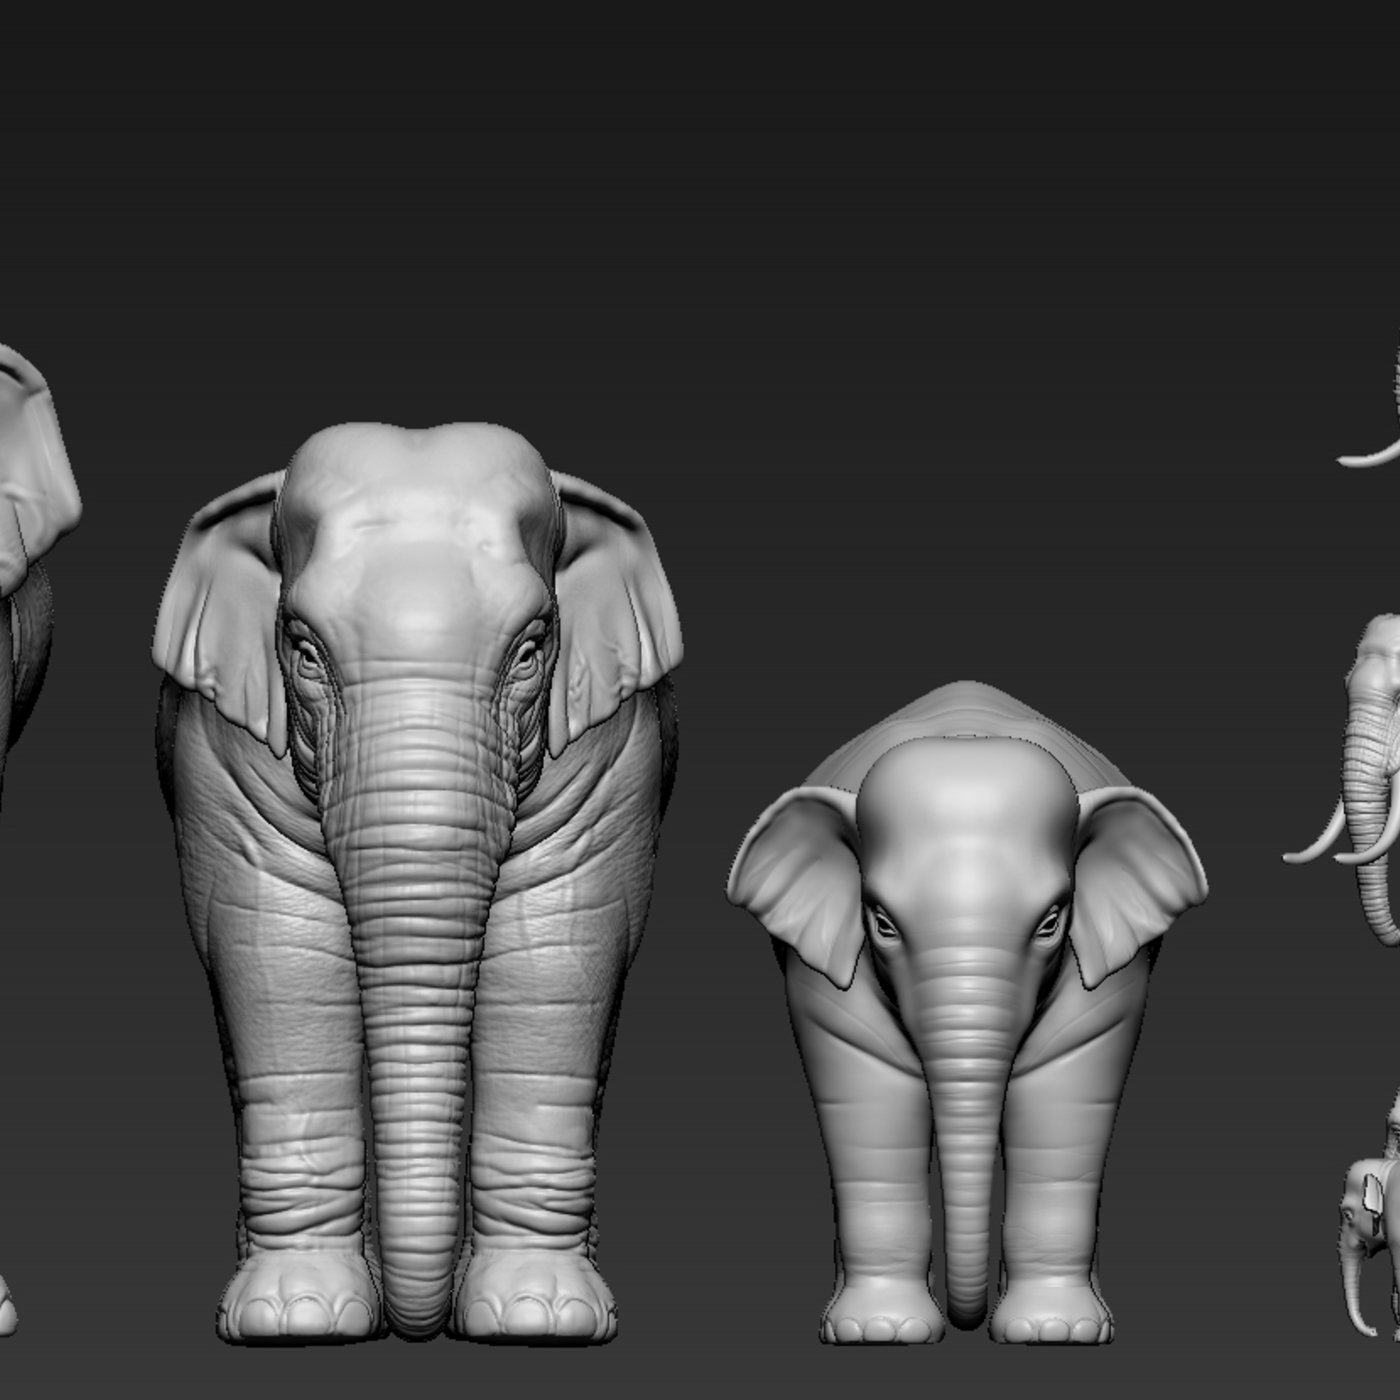 Asian elephant families